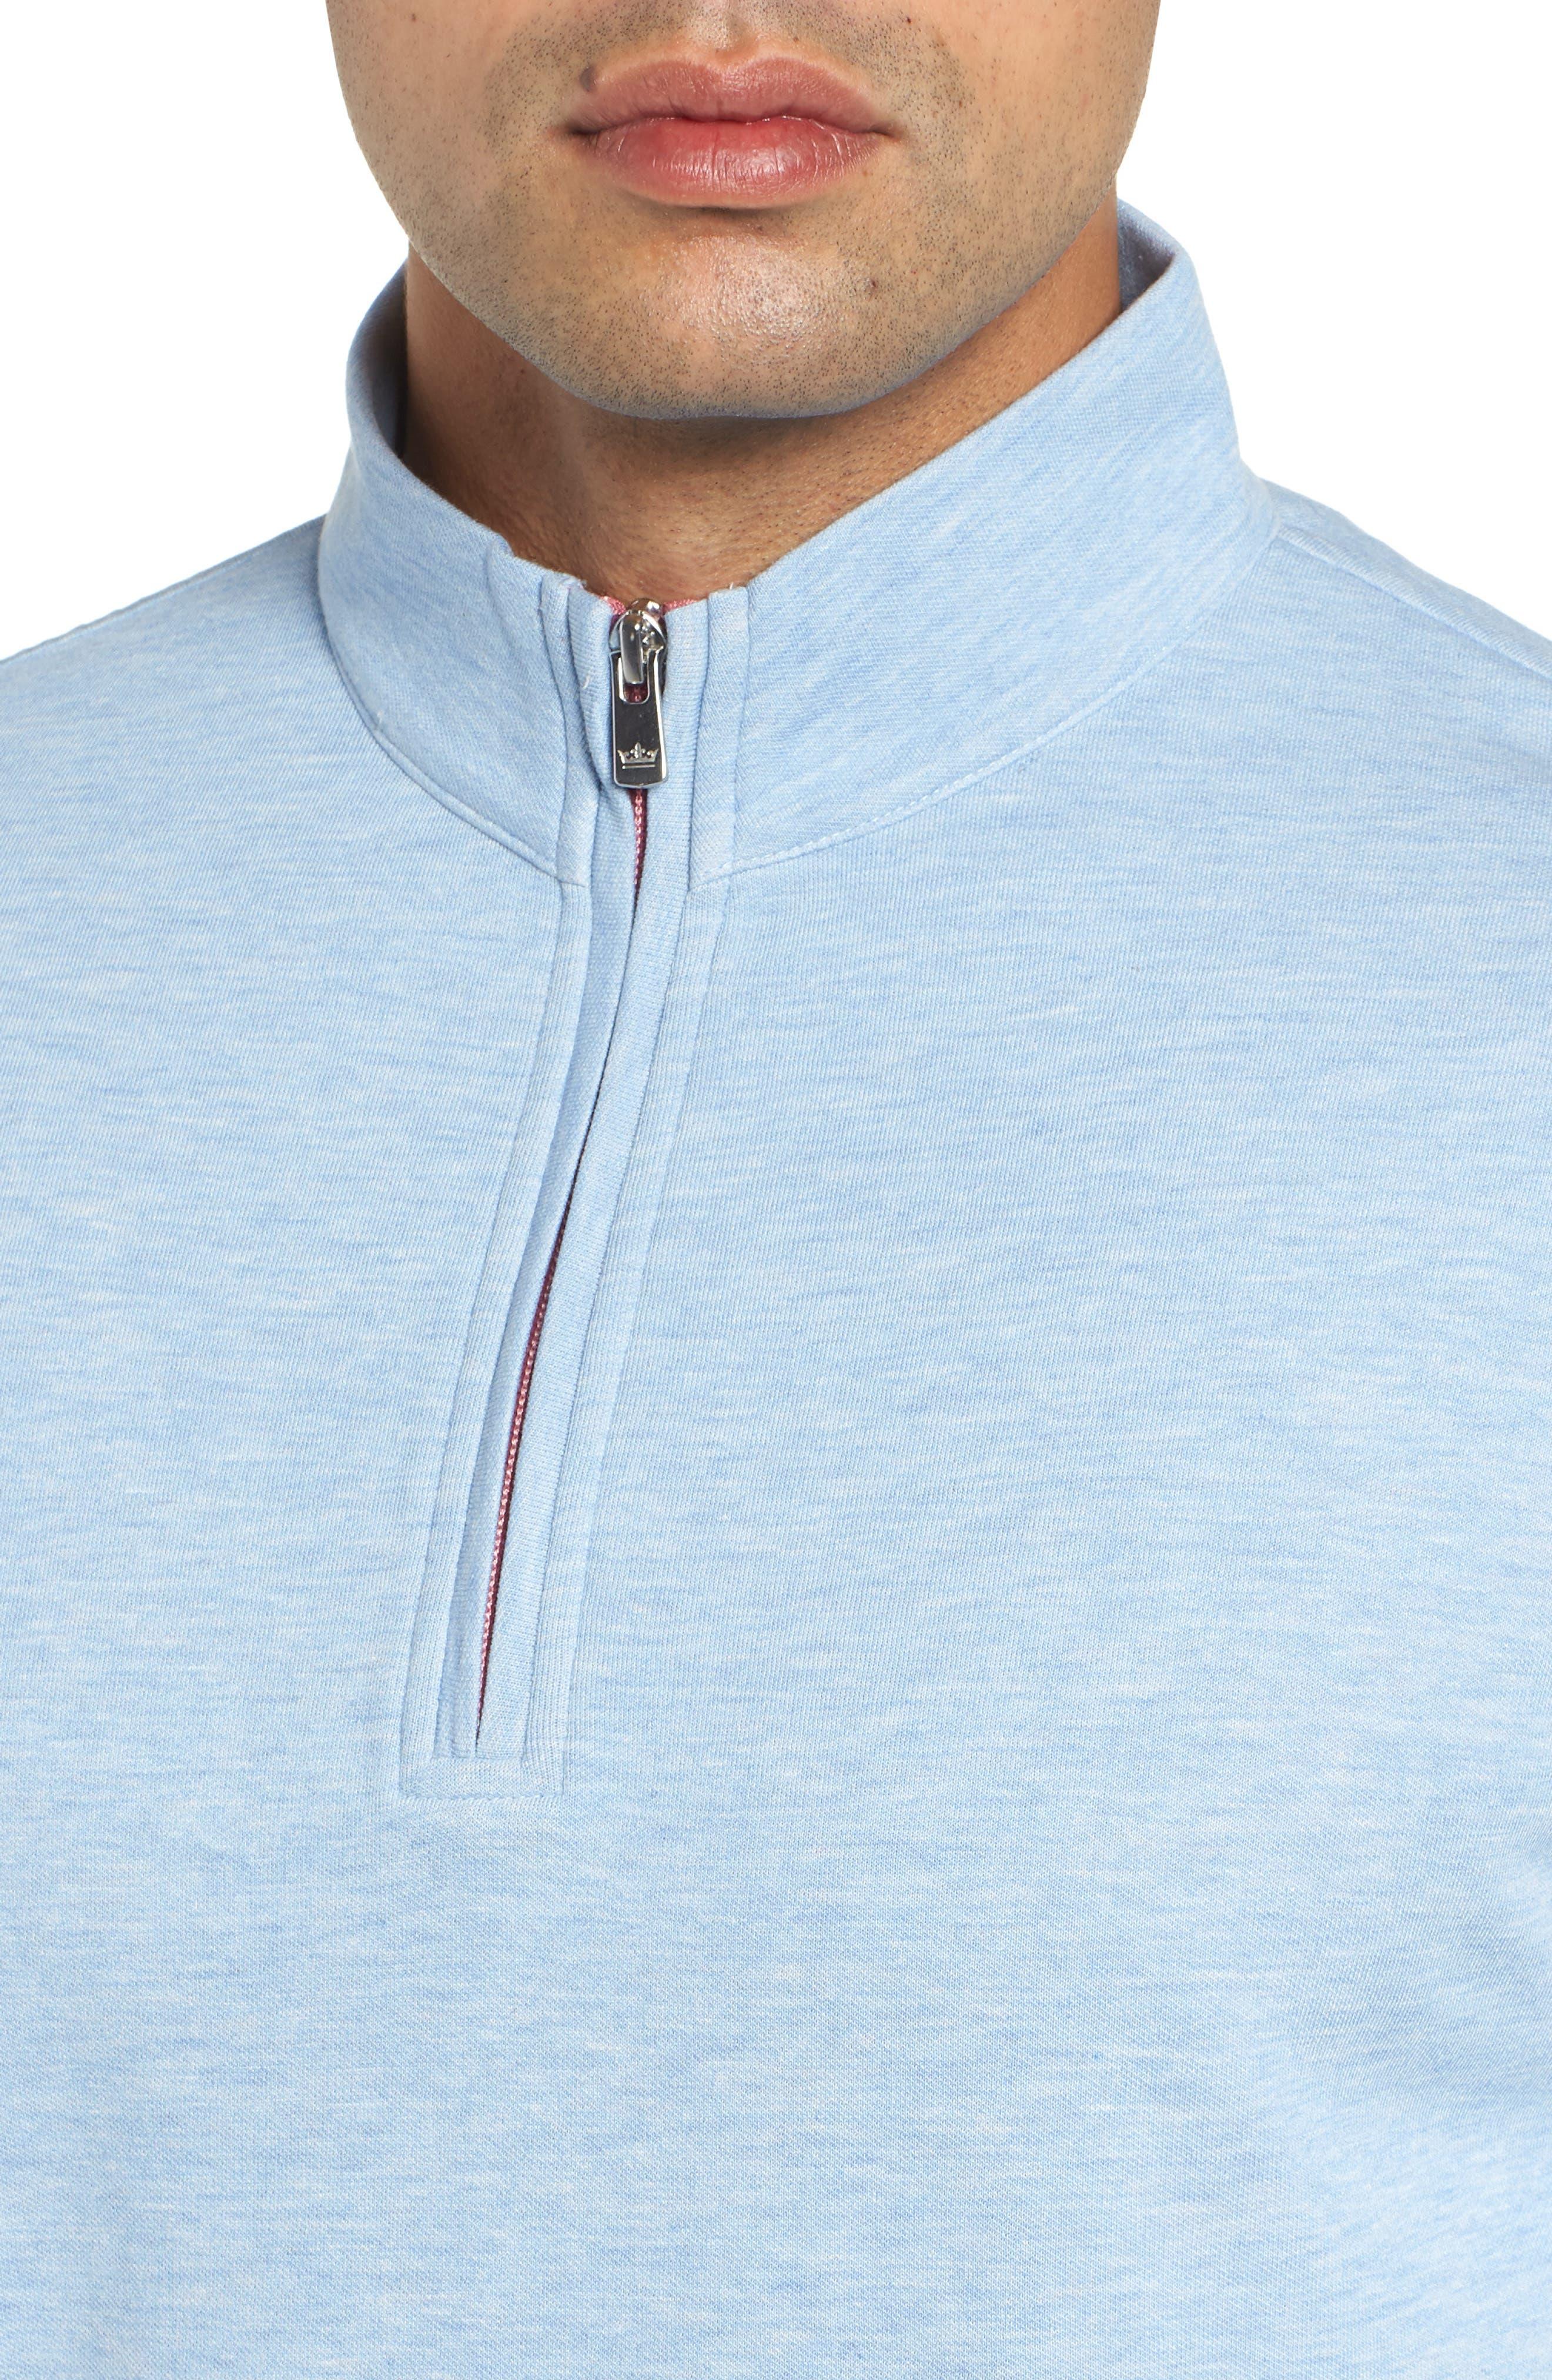 Crown Comfort Jersey Quarter Zip Pullover,                             Alternate thumbnail 4, color,                             COTTAGE BLUE